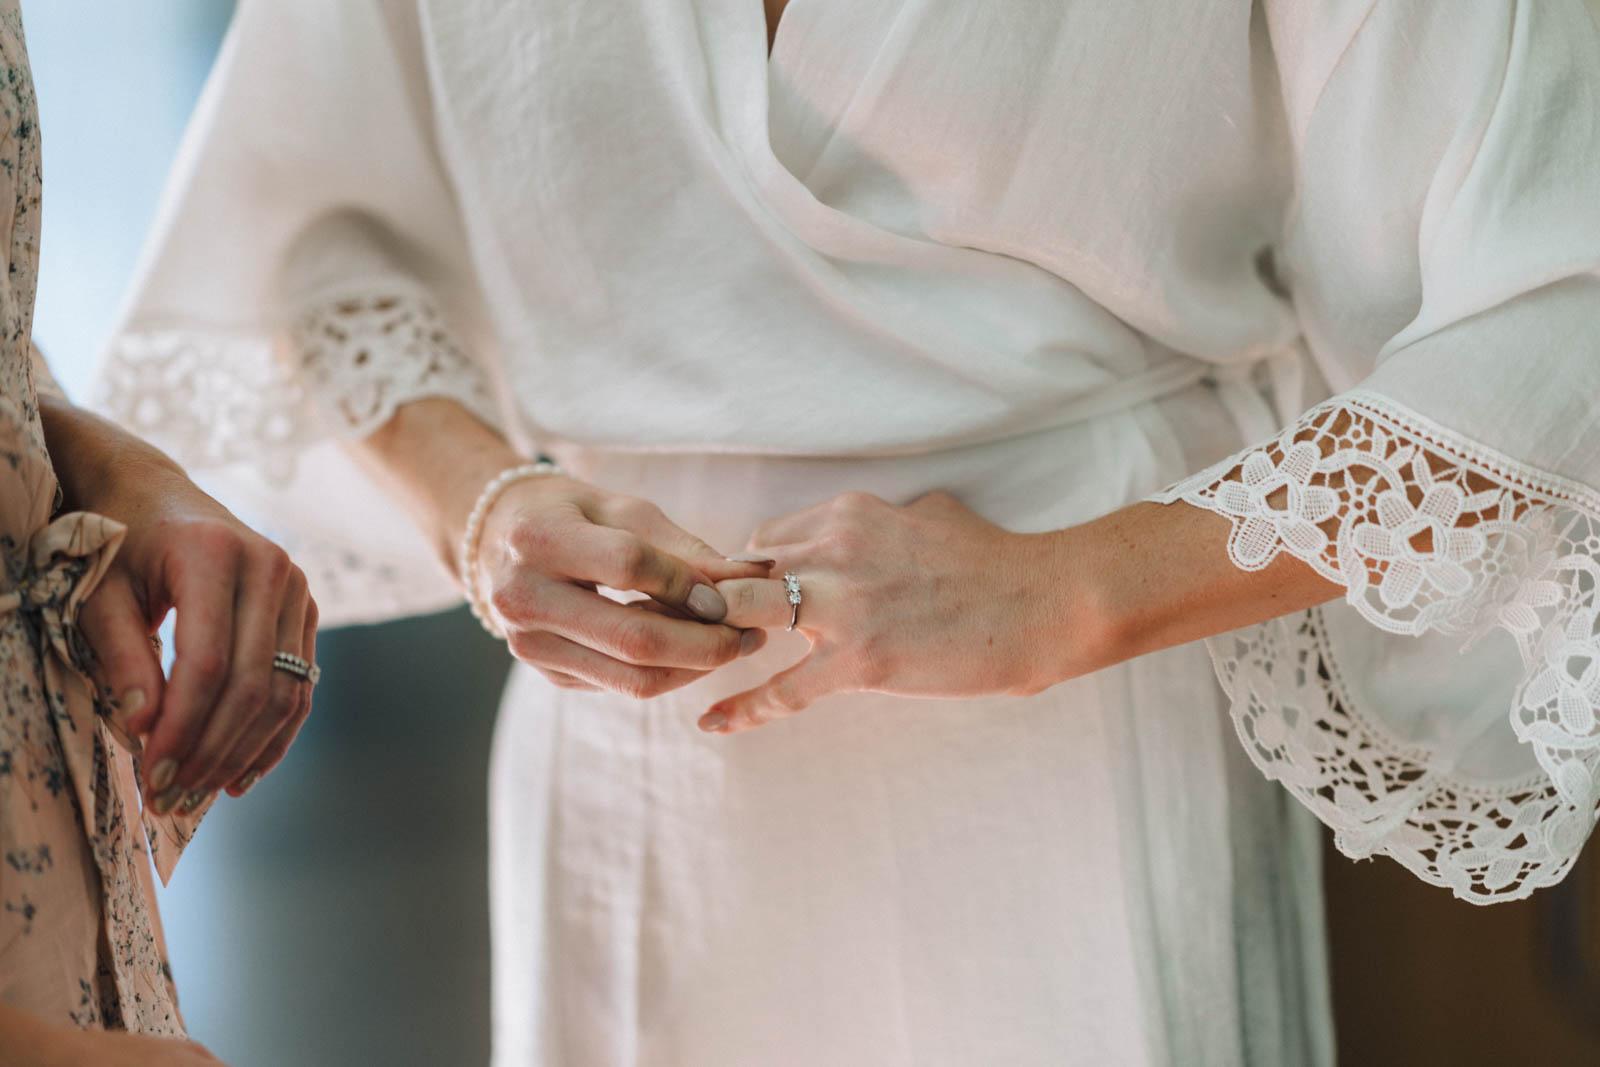 newfound-s-p-mt-maunganui-tauranga-wedding-photographer-1330-A9_04123